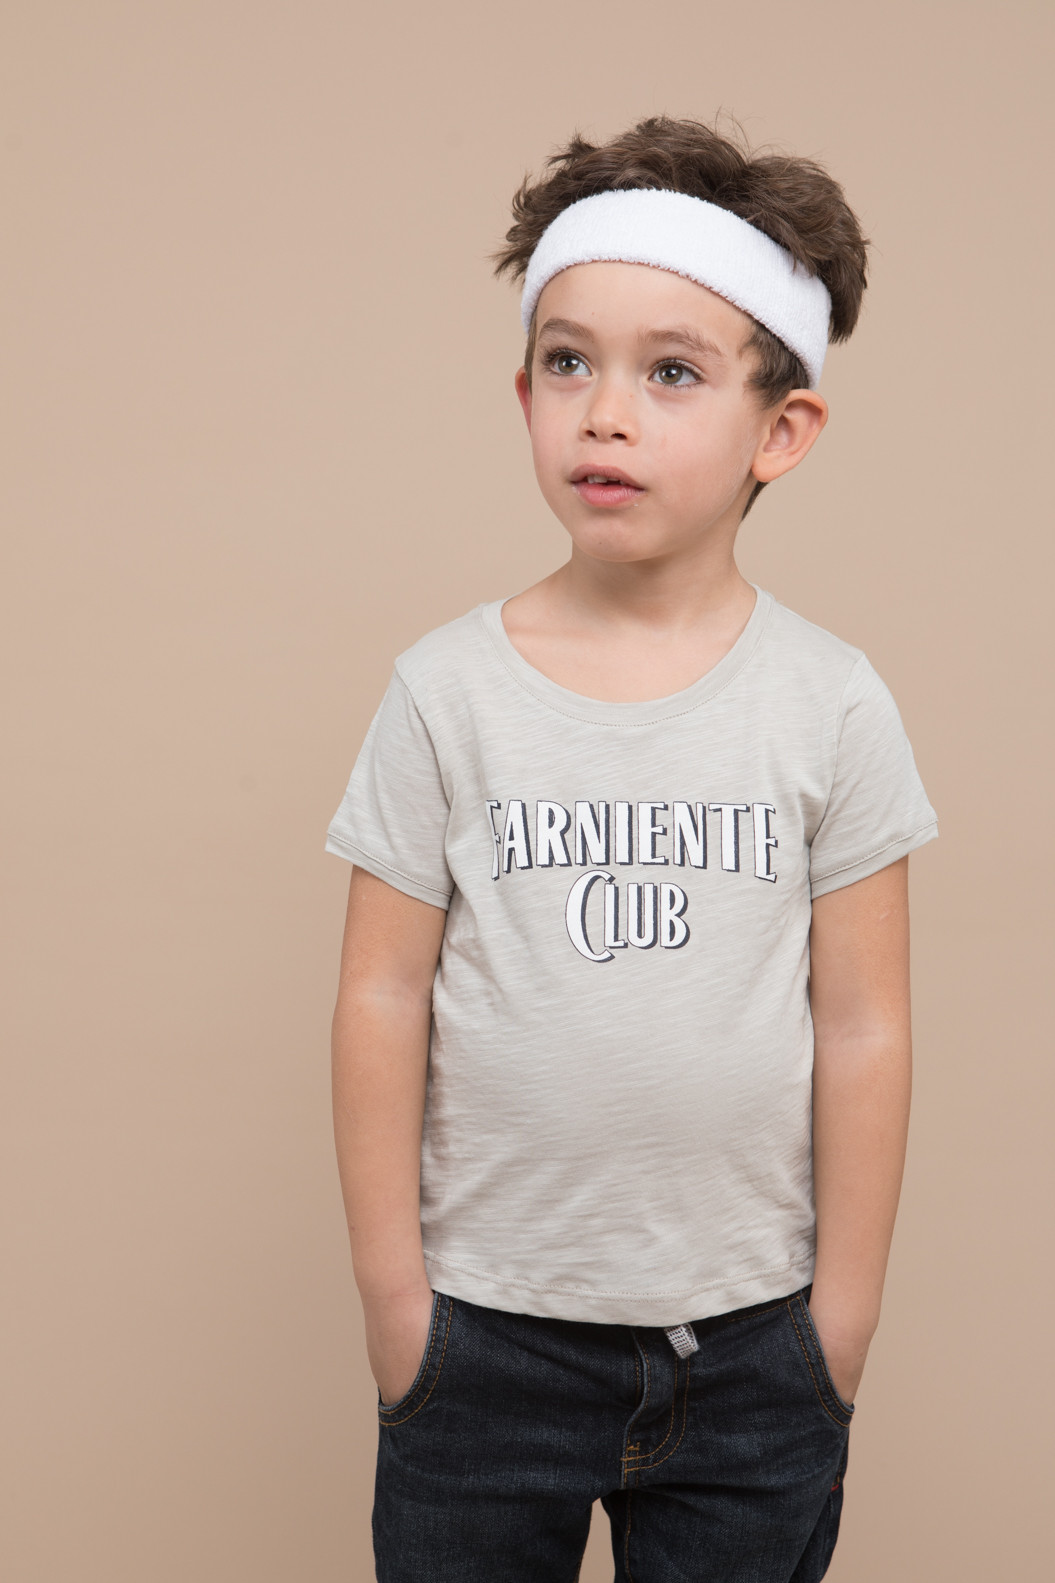 Little Farniente T-shirt